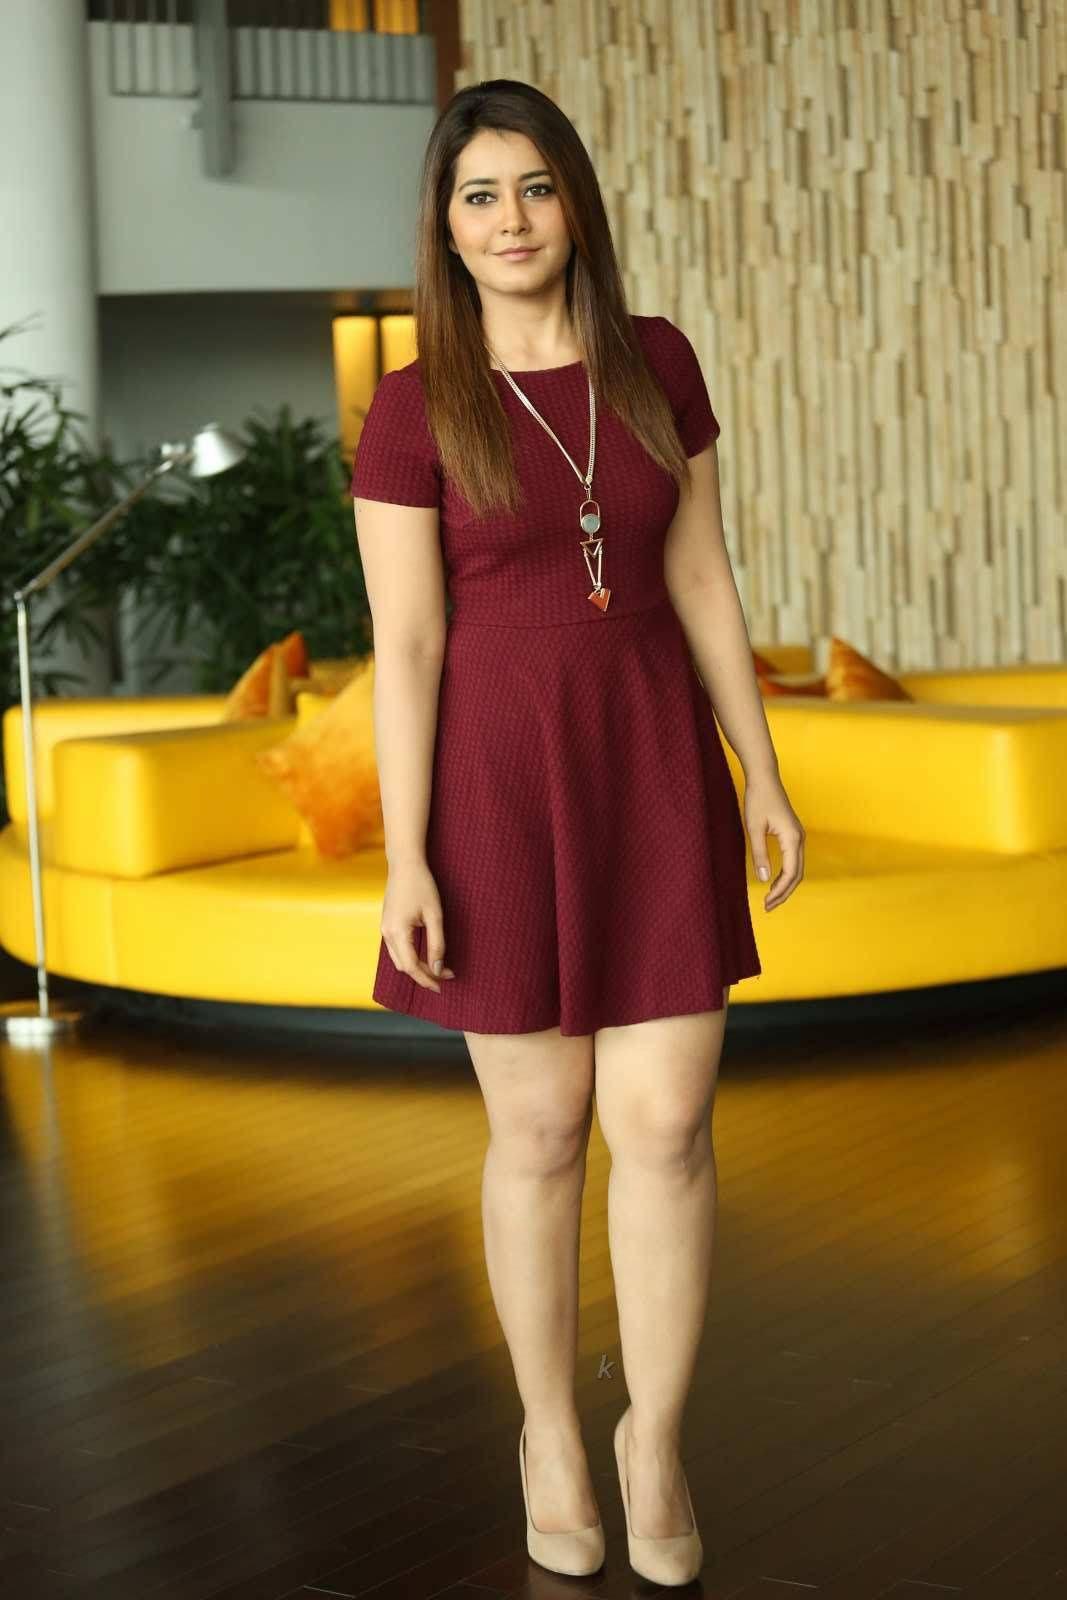 Rashi Khannna Latest Photos in Maroon Dress Rashi Khanna